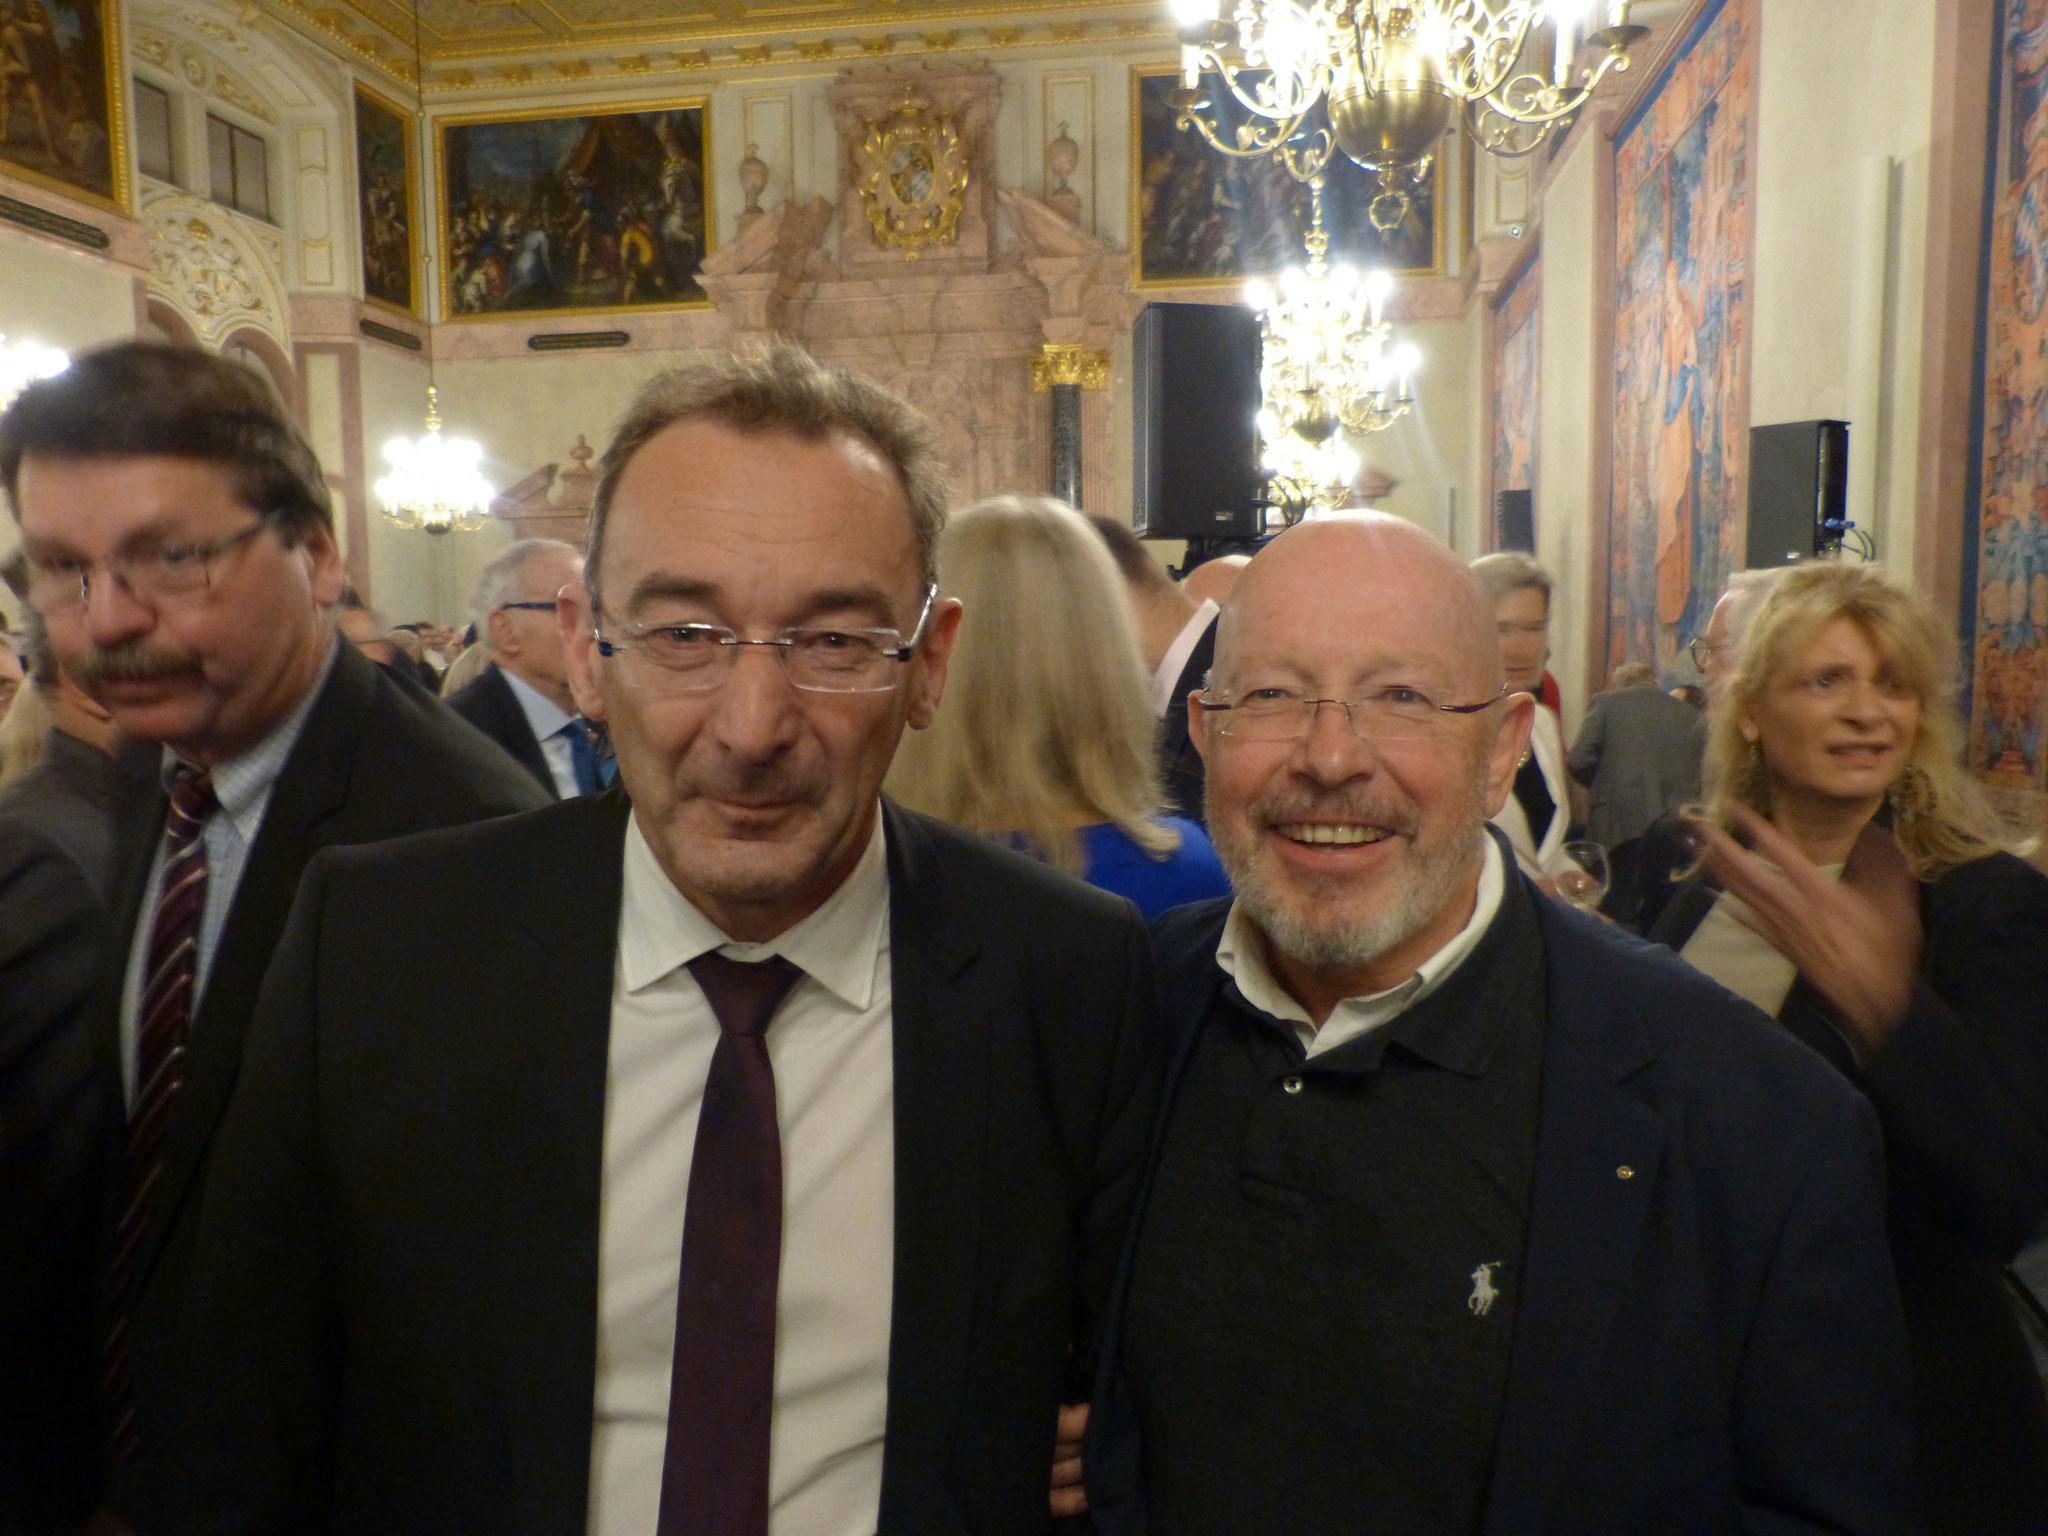 BRSI Vorstand Dr. Dieter Körner mit dem WBU-Generalsekretär Dr. Johann Schachtner